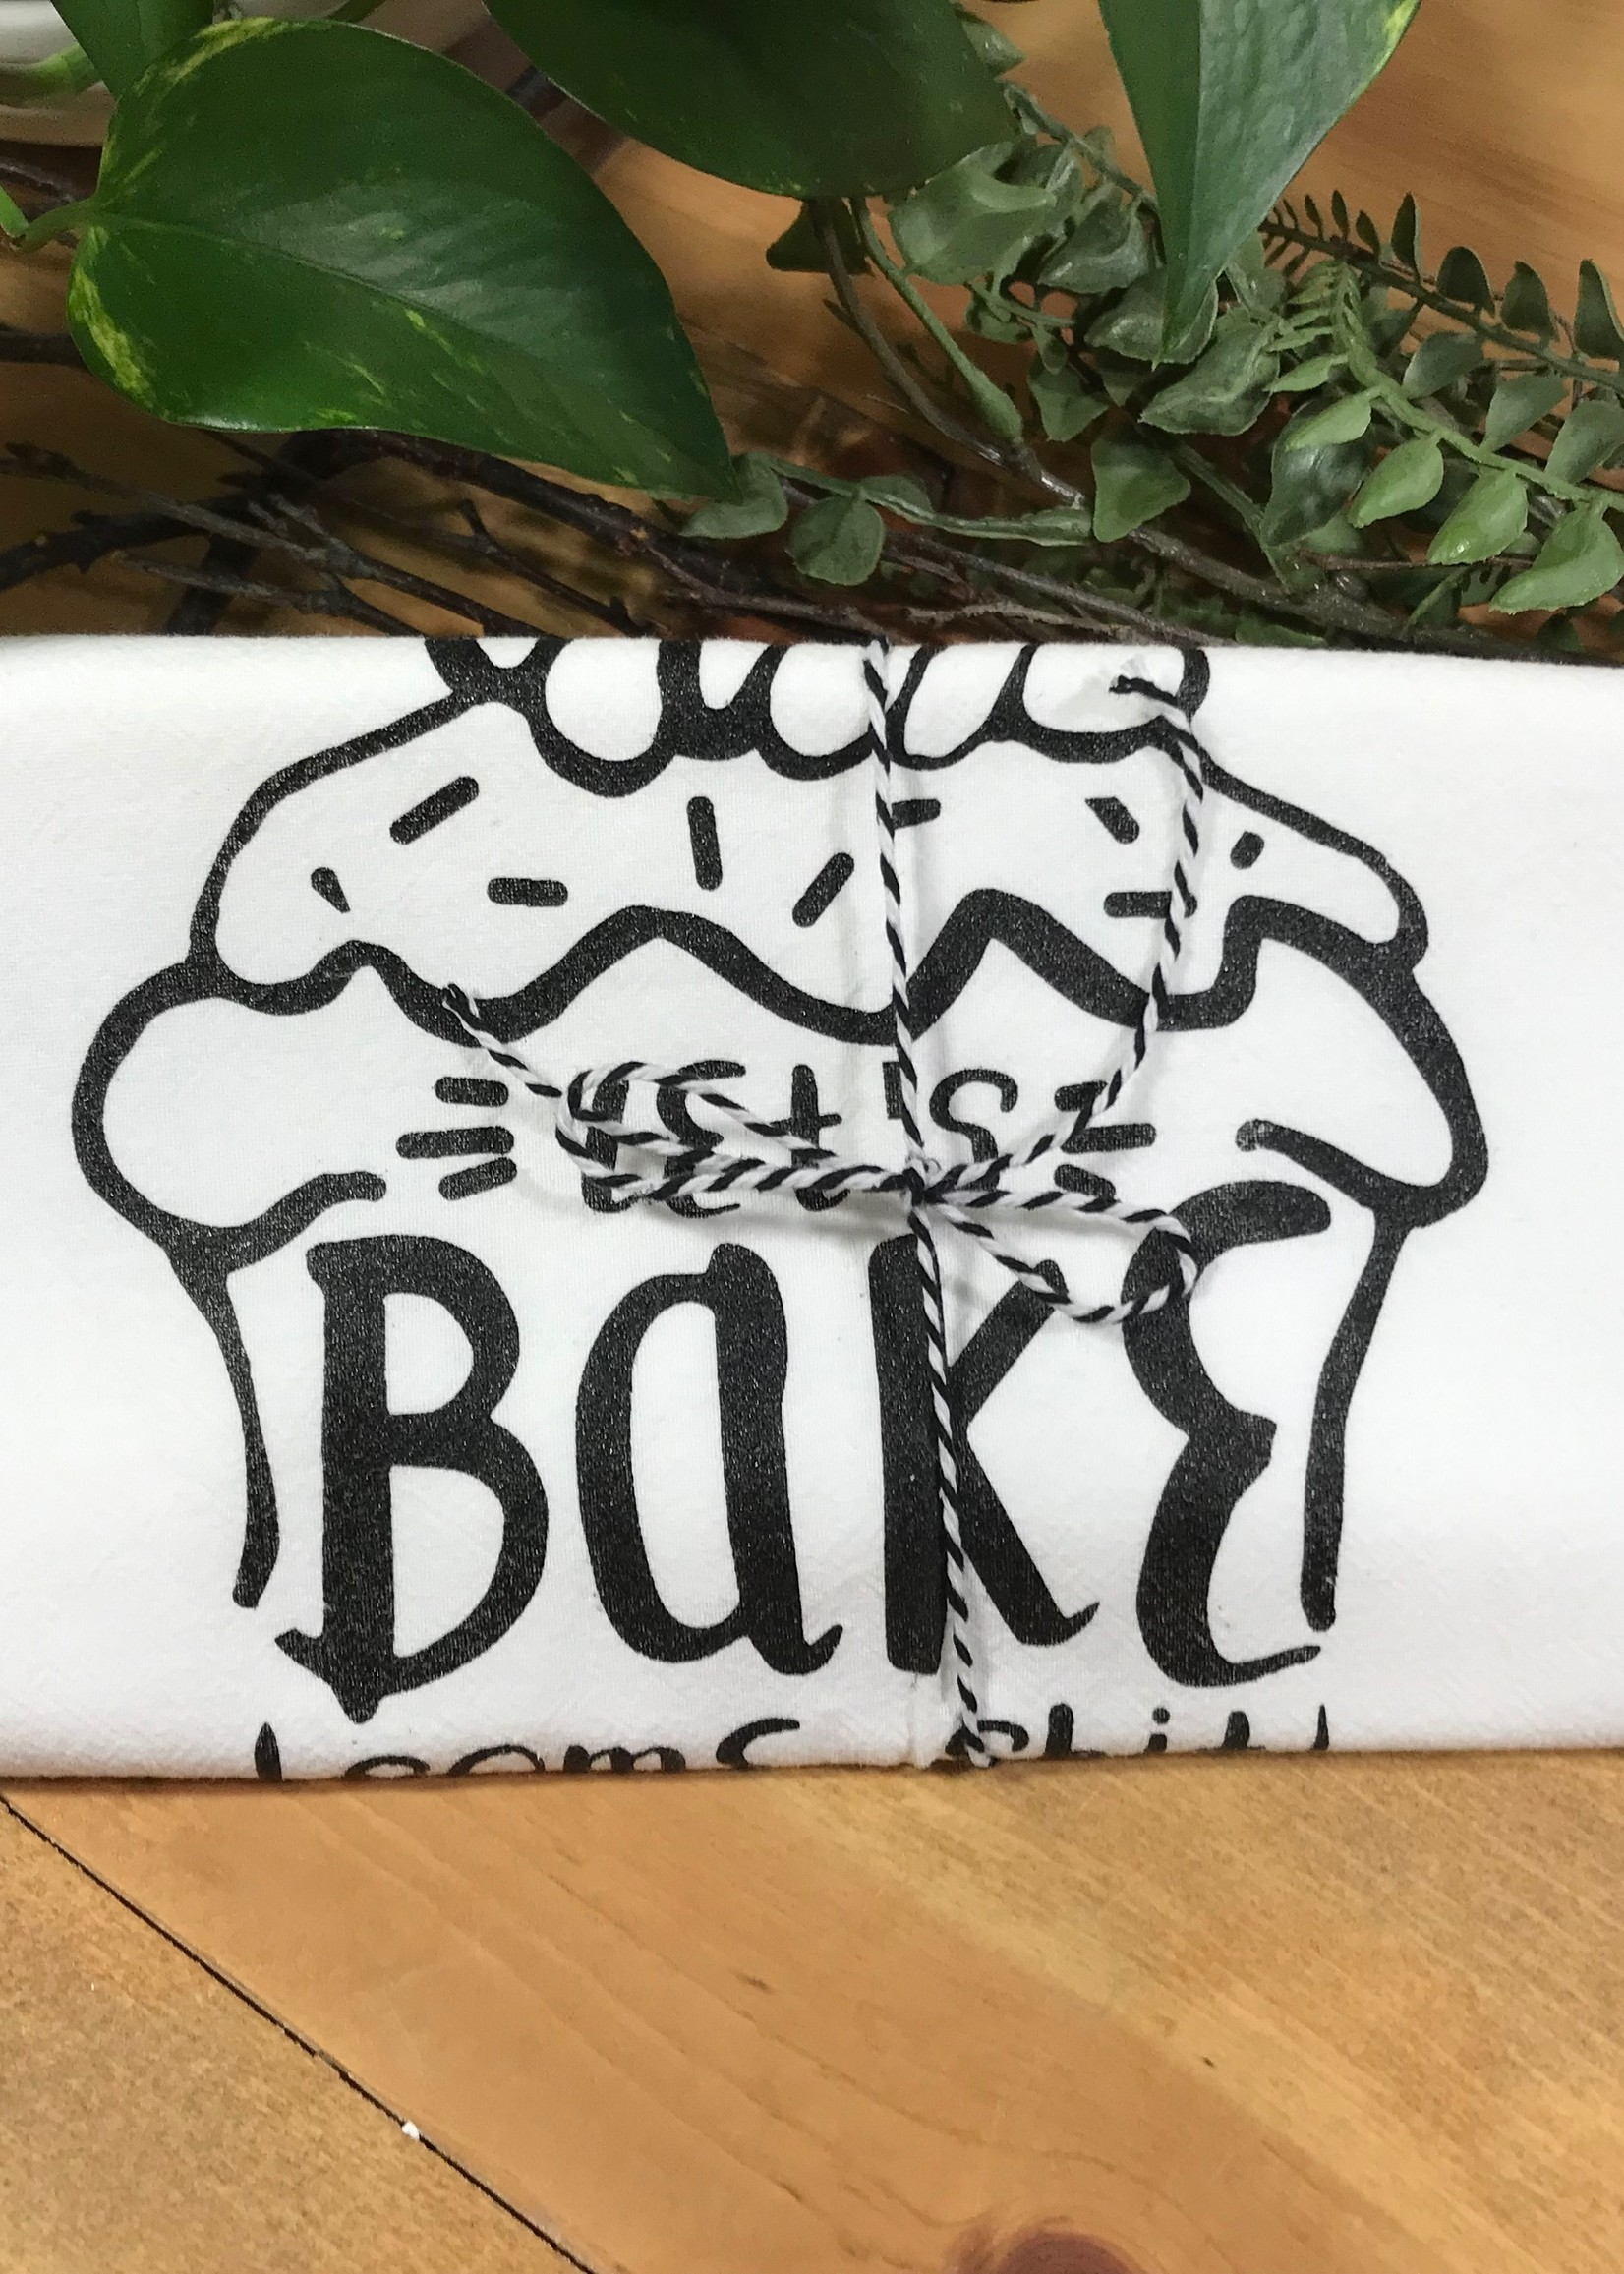 Screen Printed Dish Towel Let's Bake Some Shit